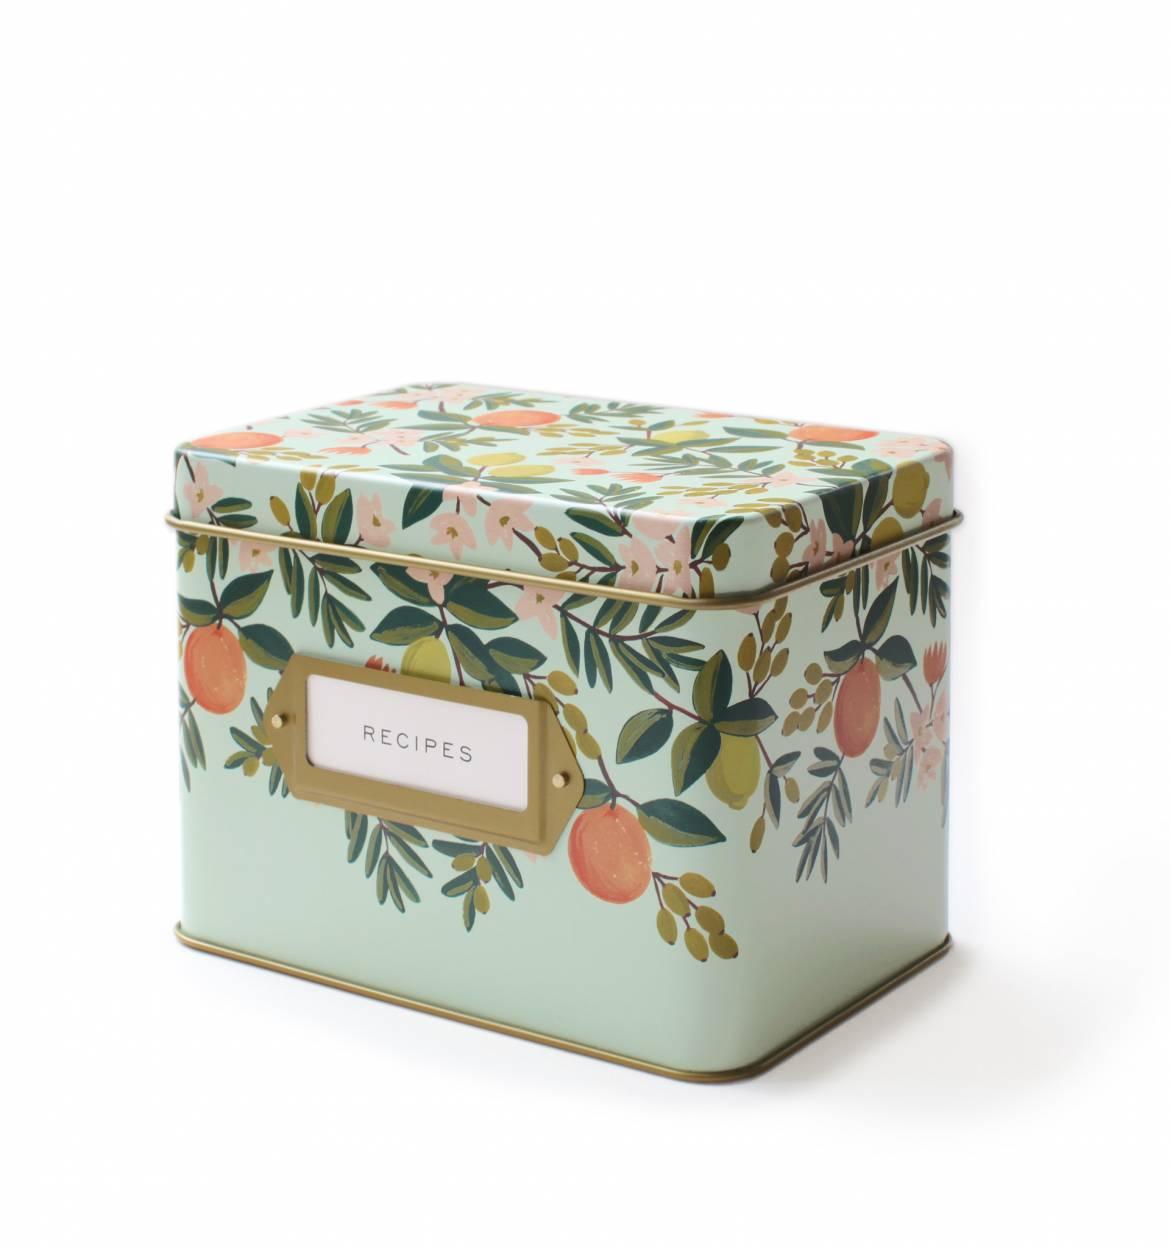 citrus-floral-kitchen-recipe-box-01_4 (1).jpg